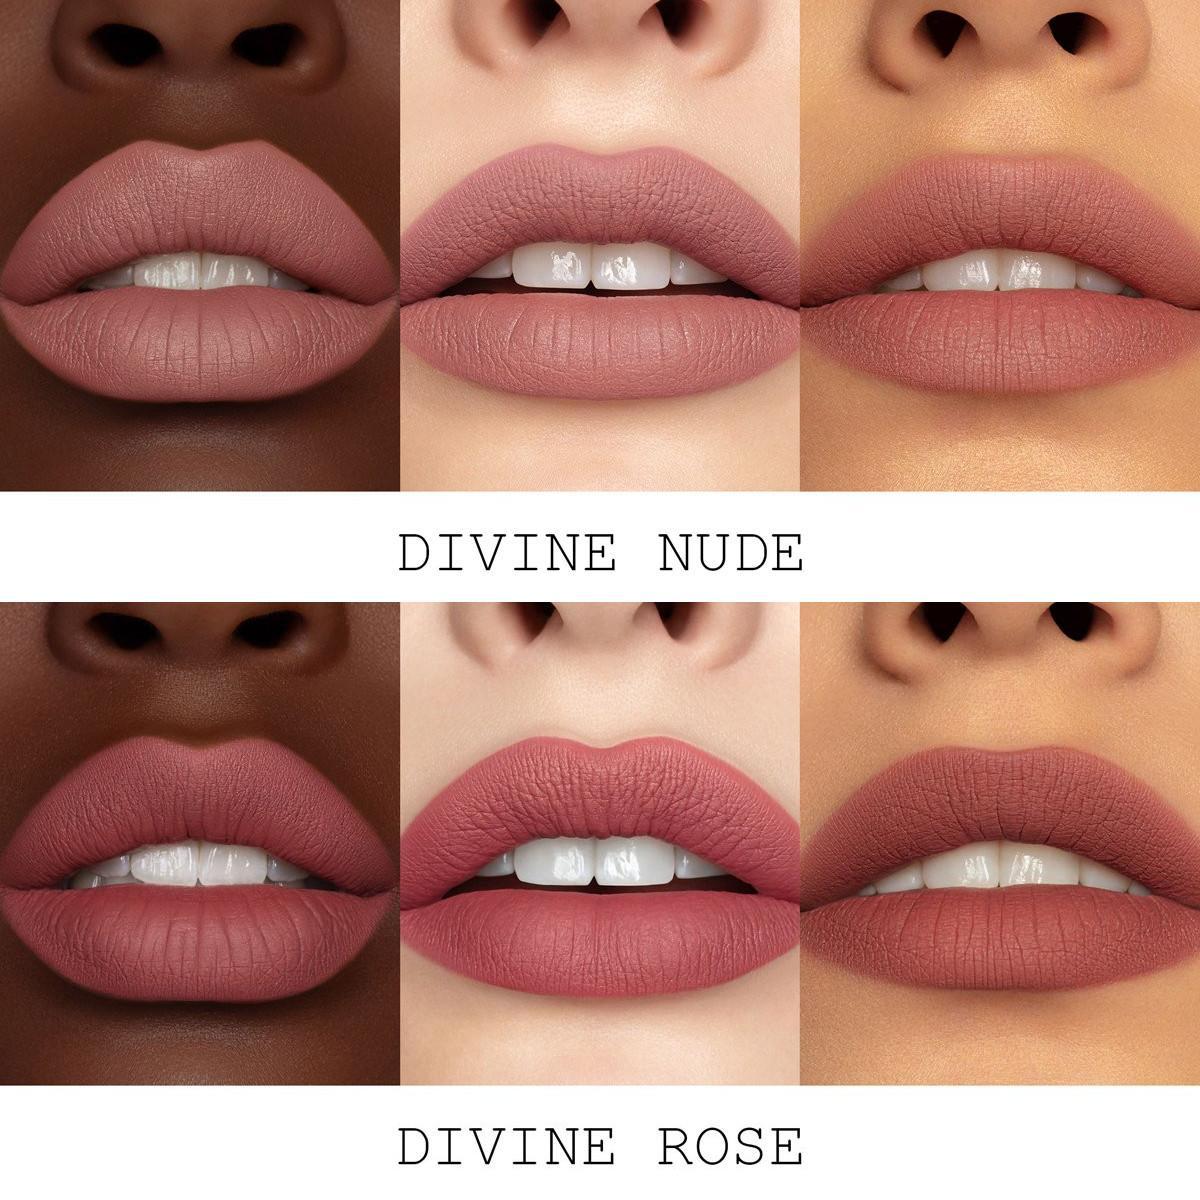 Pat McGrath Labs The Divine Rose II Collection Liquilust™ Legendary Wear Matte Lipstick In Divine Rose & Divine Nude Swatches